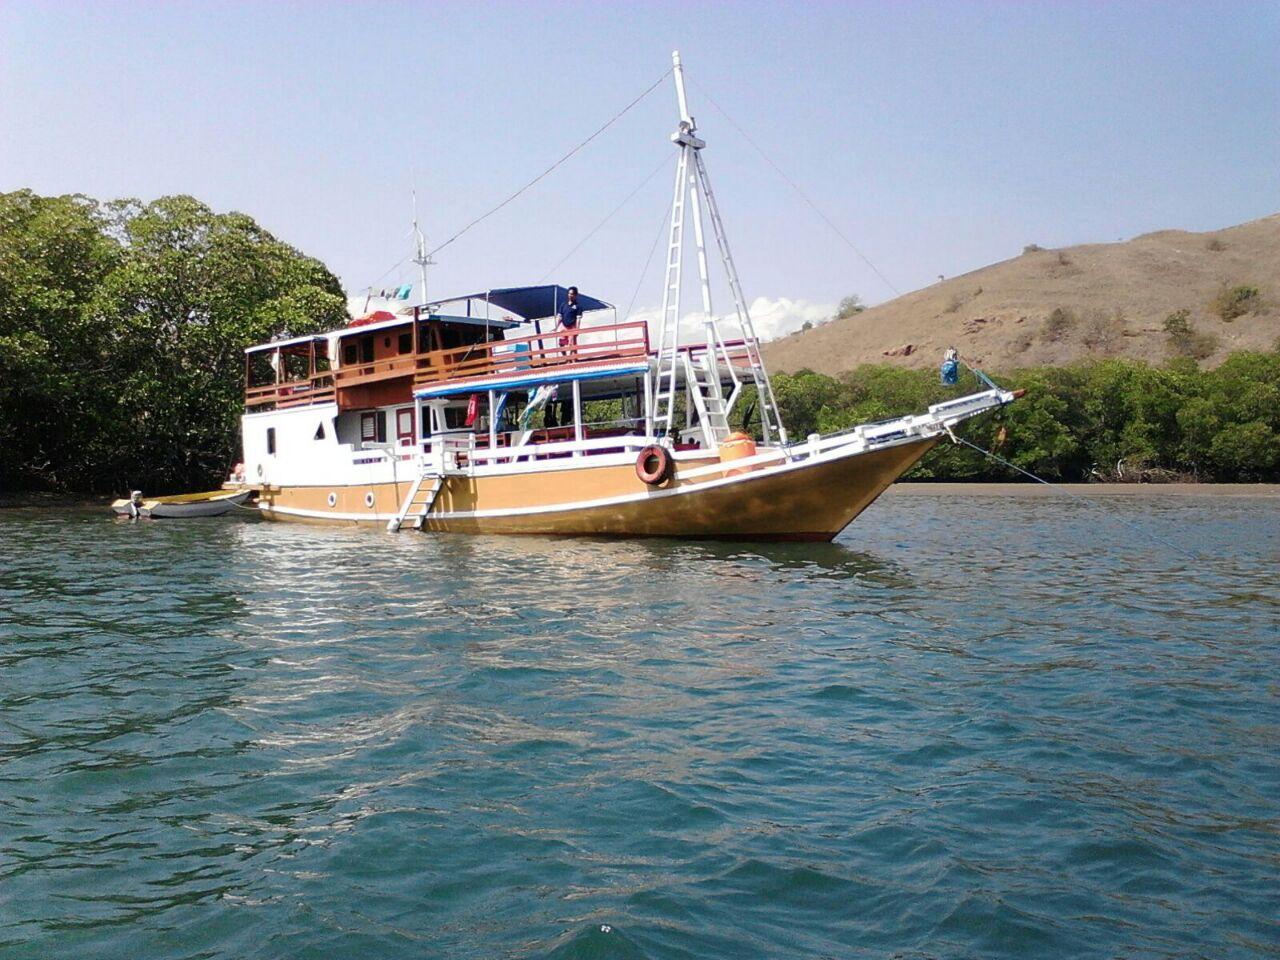 Boat of Komodo island trips